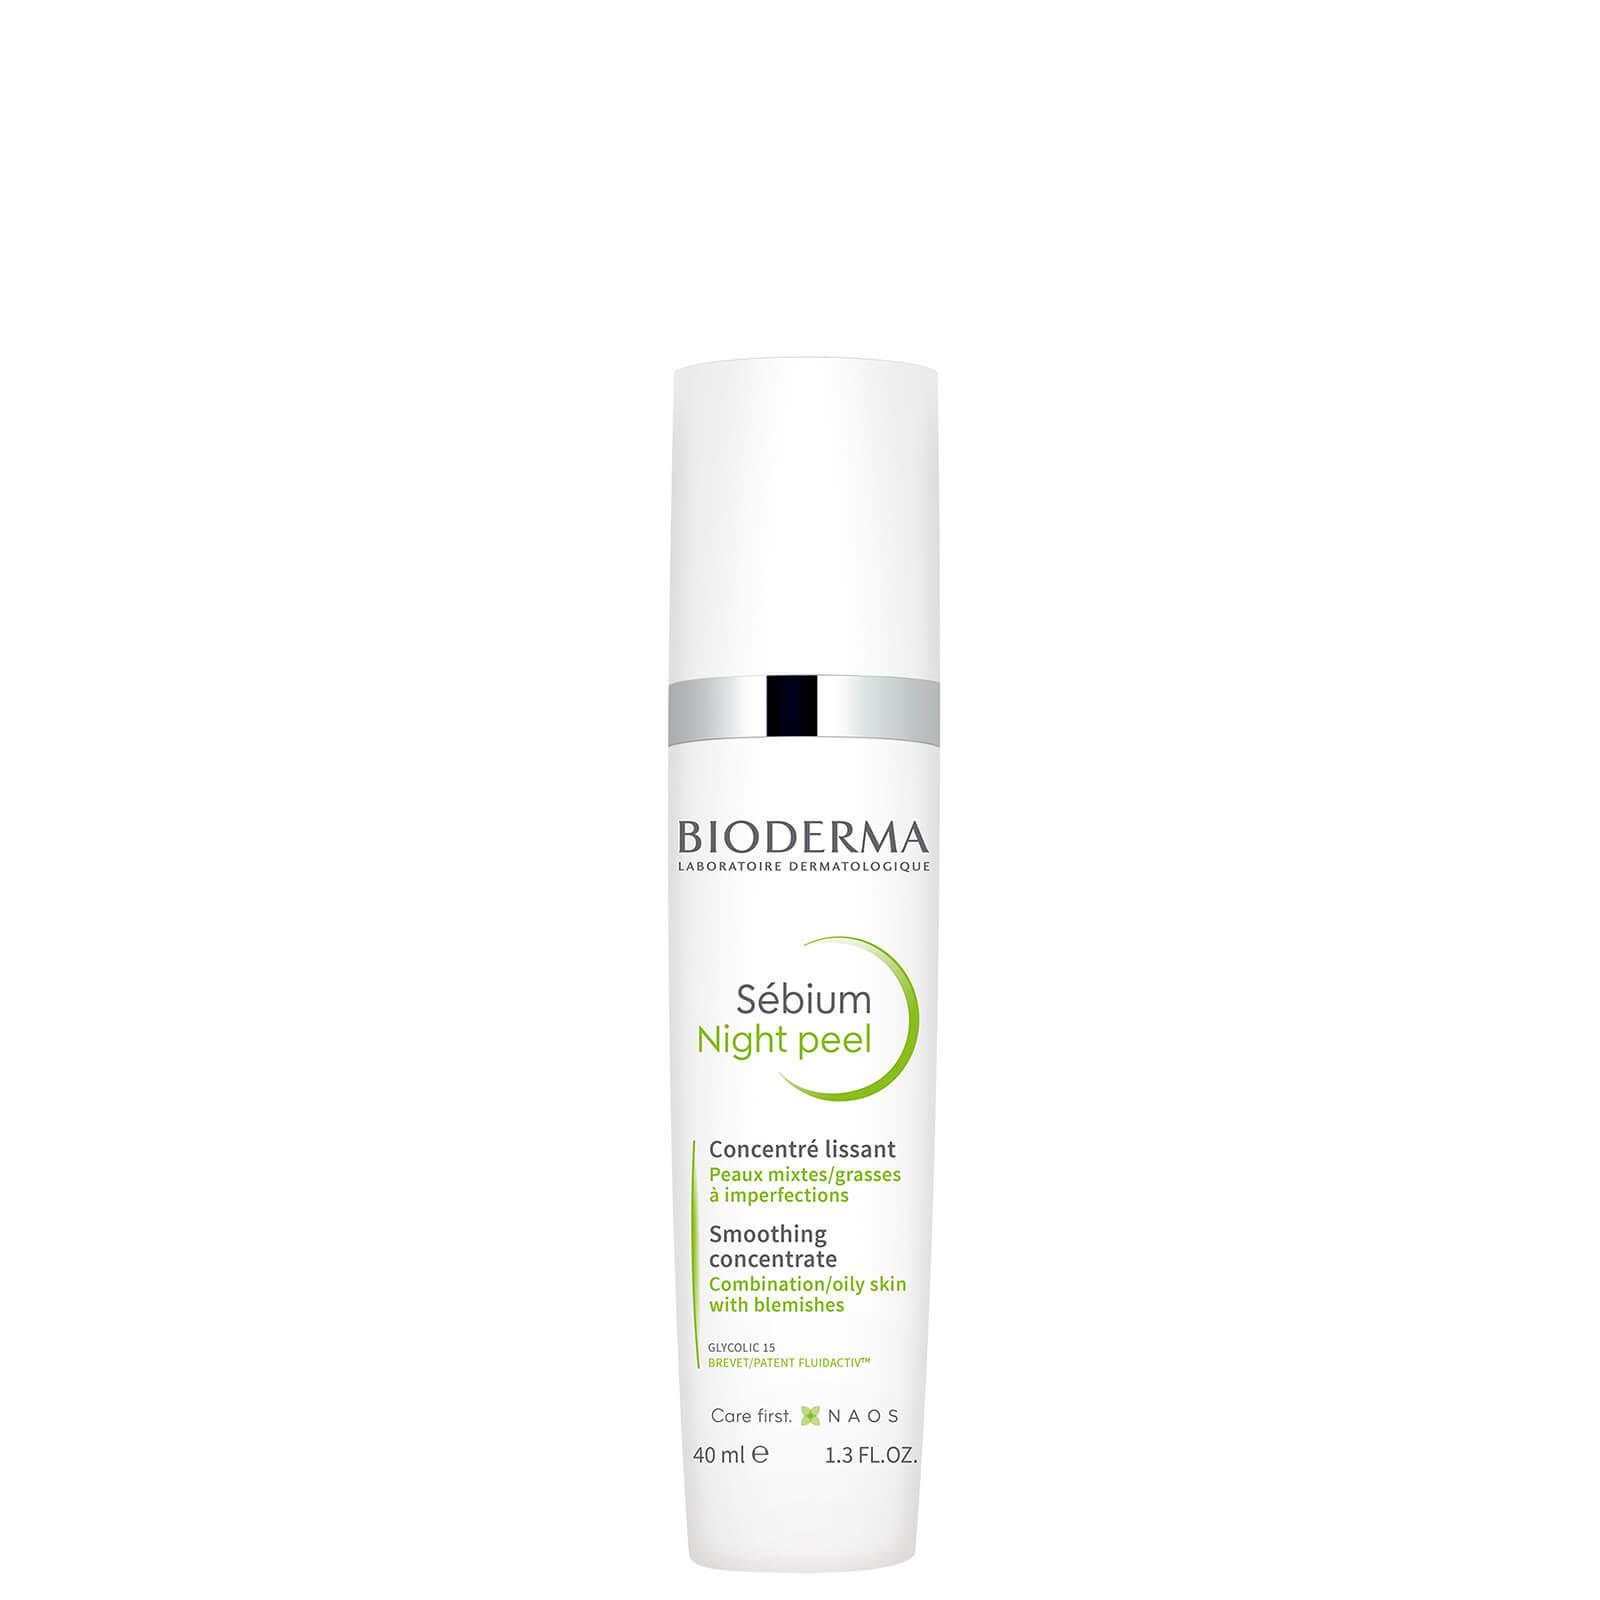 Купить Bioderma Sébium Night Peel Smoothing Concentrate Gel 40ml